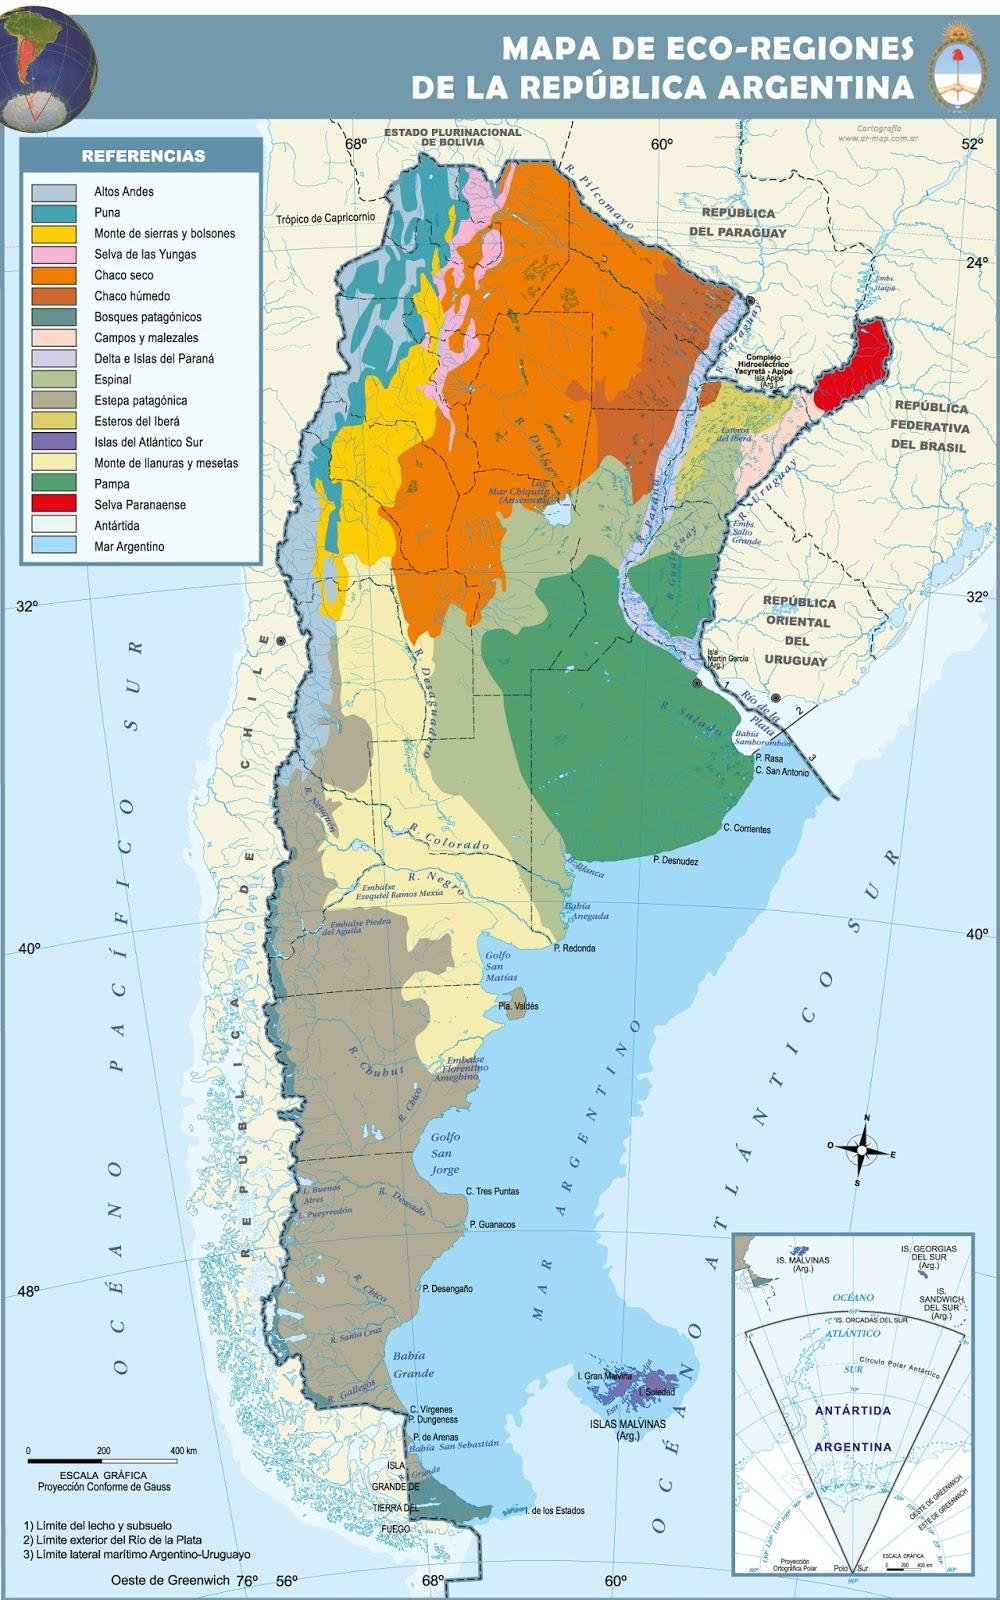 Aves de argentina ecorregiones for Ministerio del interior ubicacion mapa